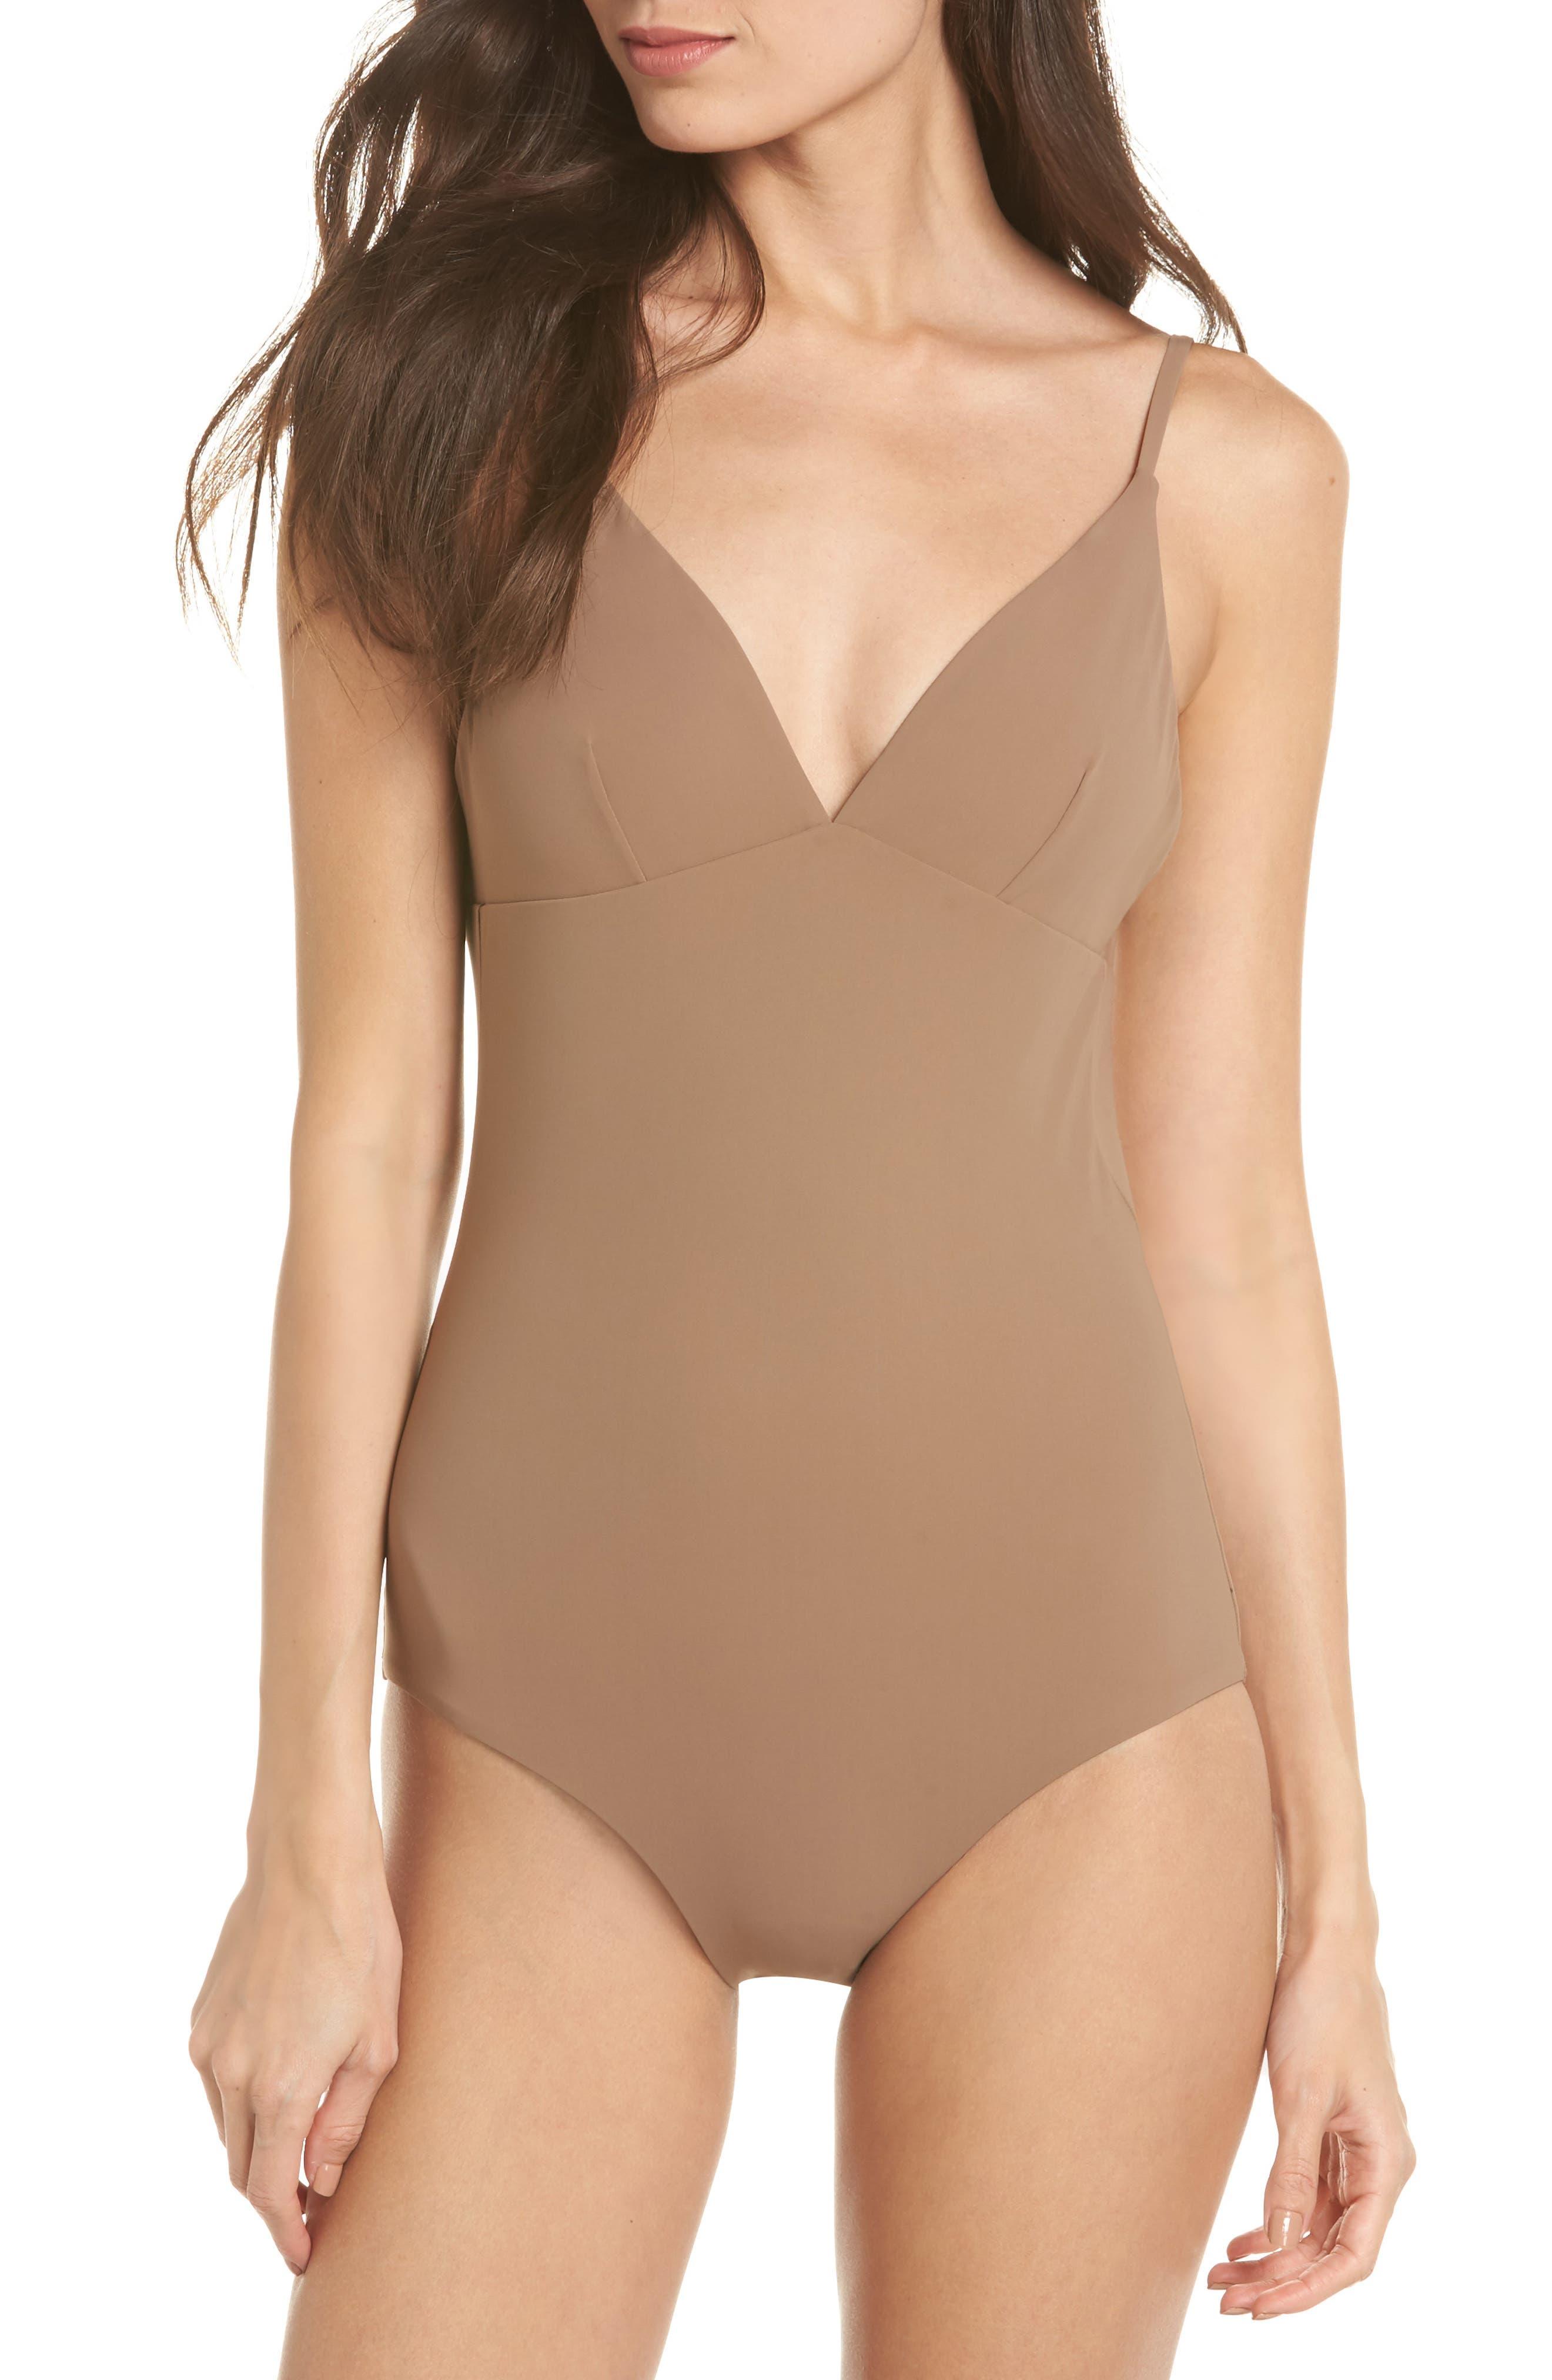 Tory Burch Marina One-Piece Swimsuit